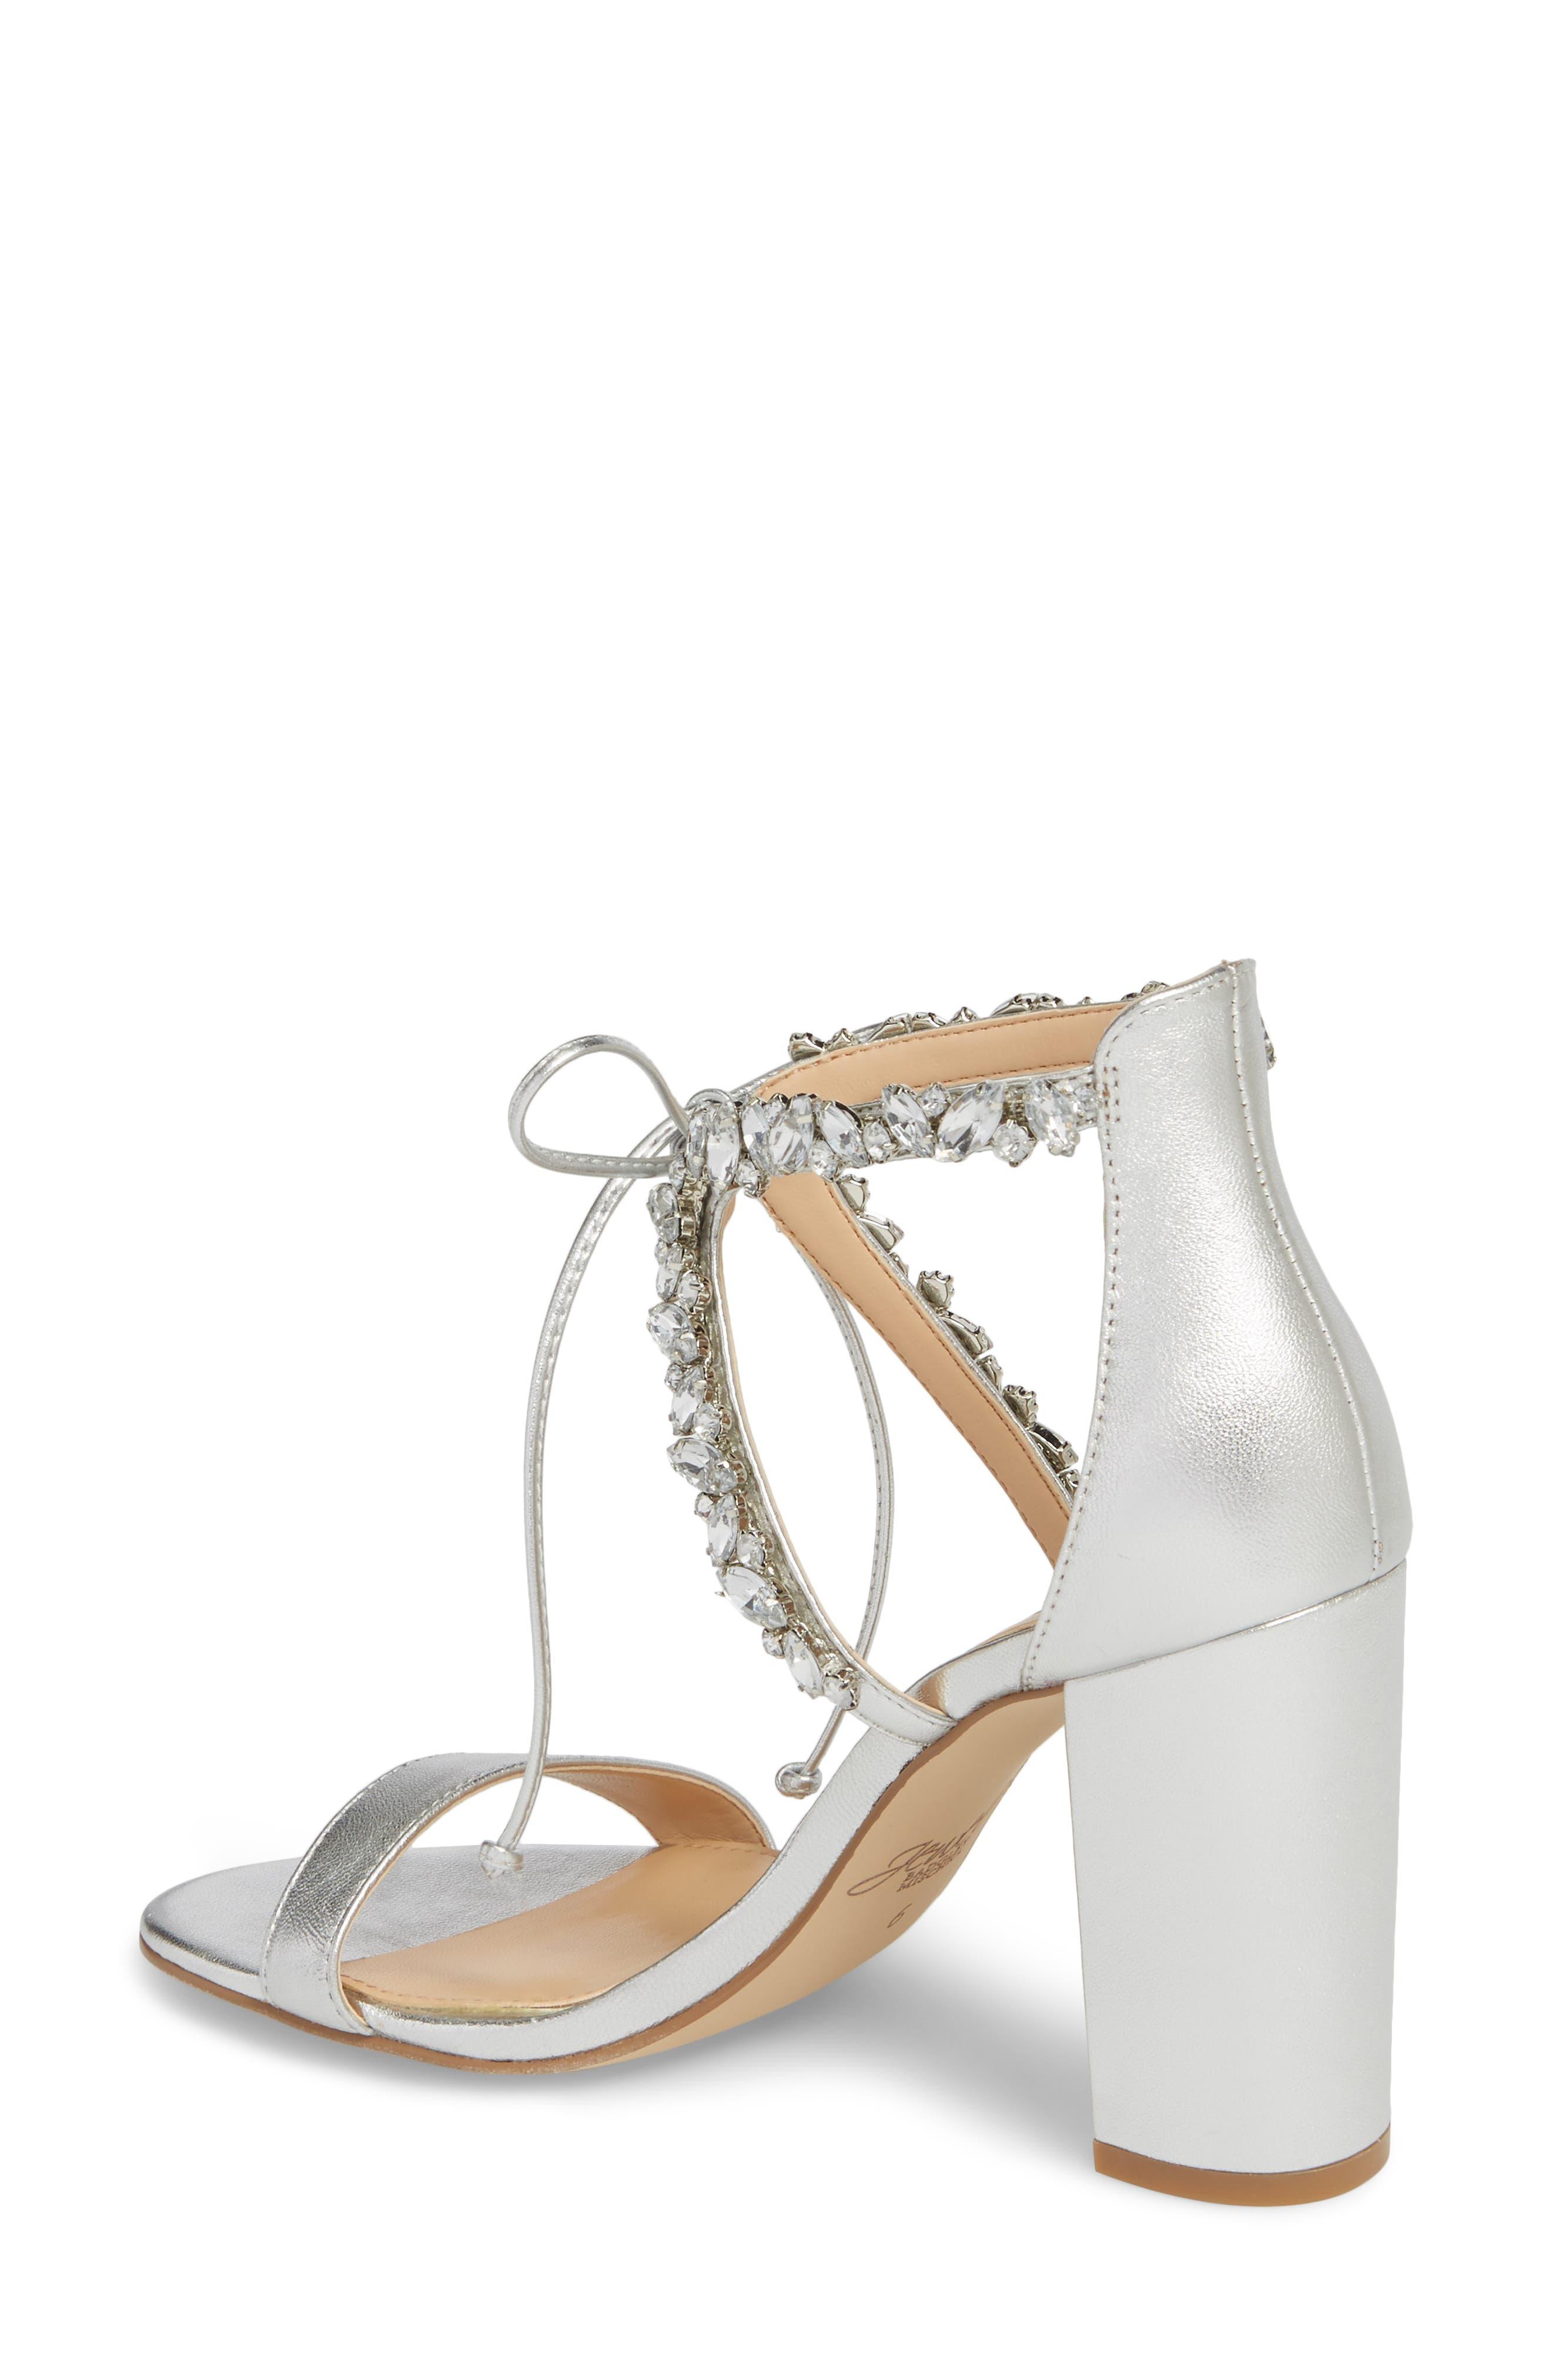 Thamar Embellished Sandal,                             Alternate thumbnail 2, color,                             Silver Leather